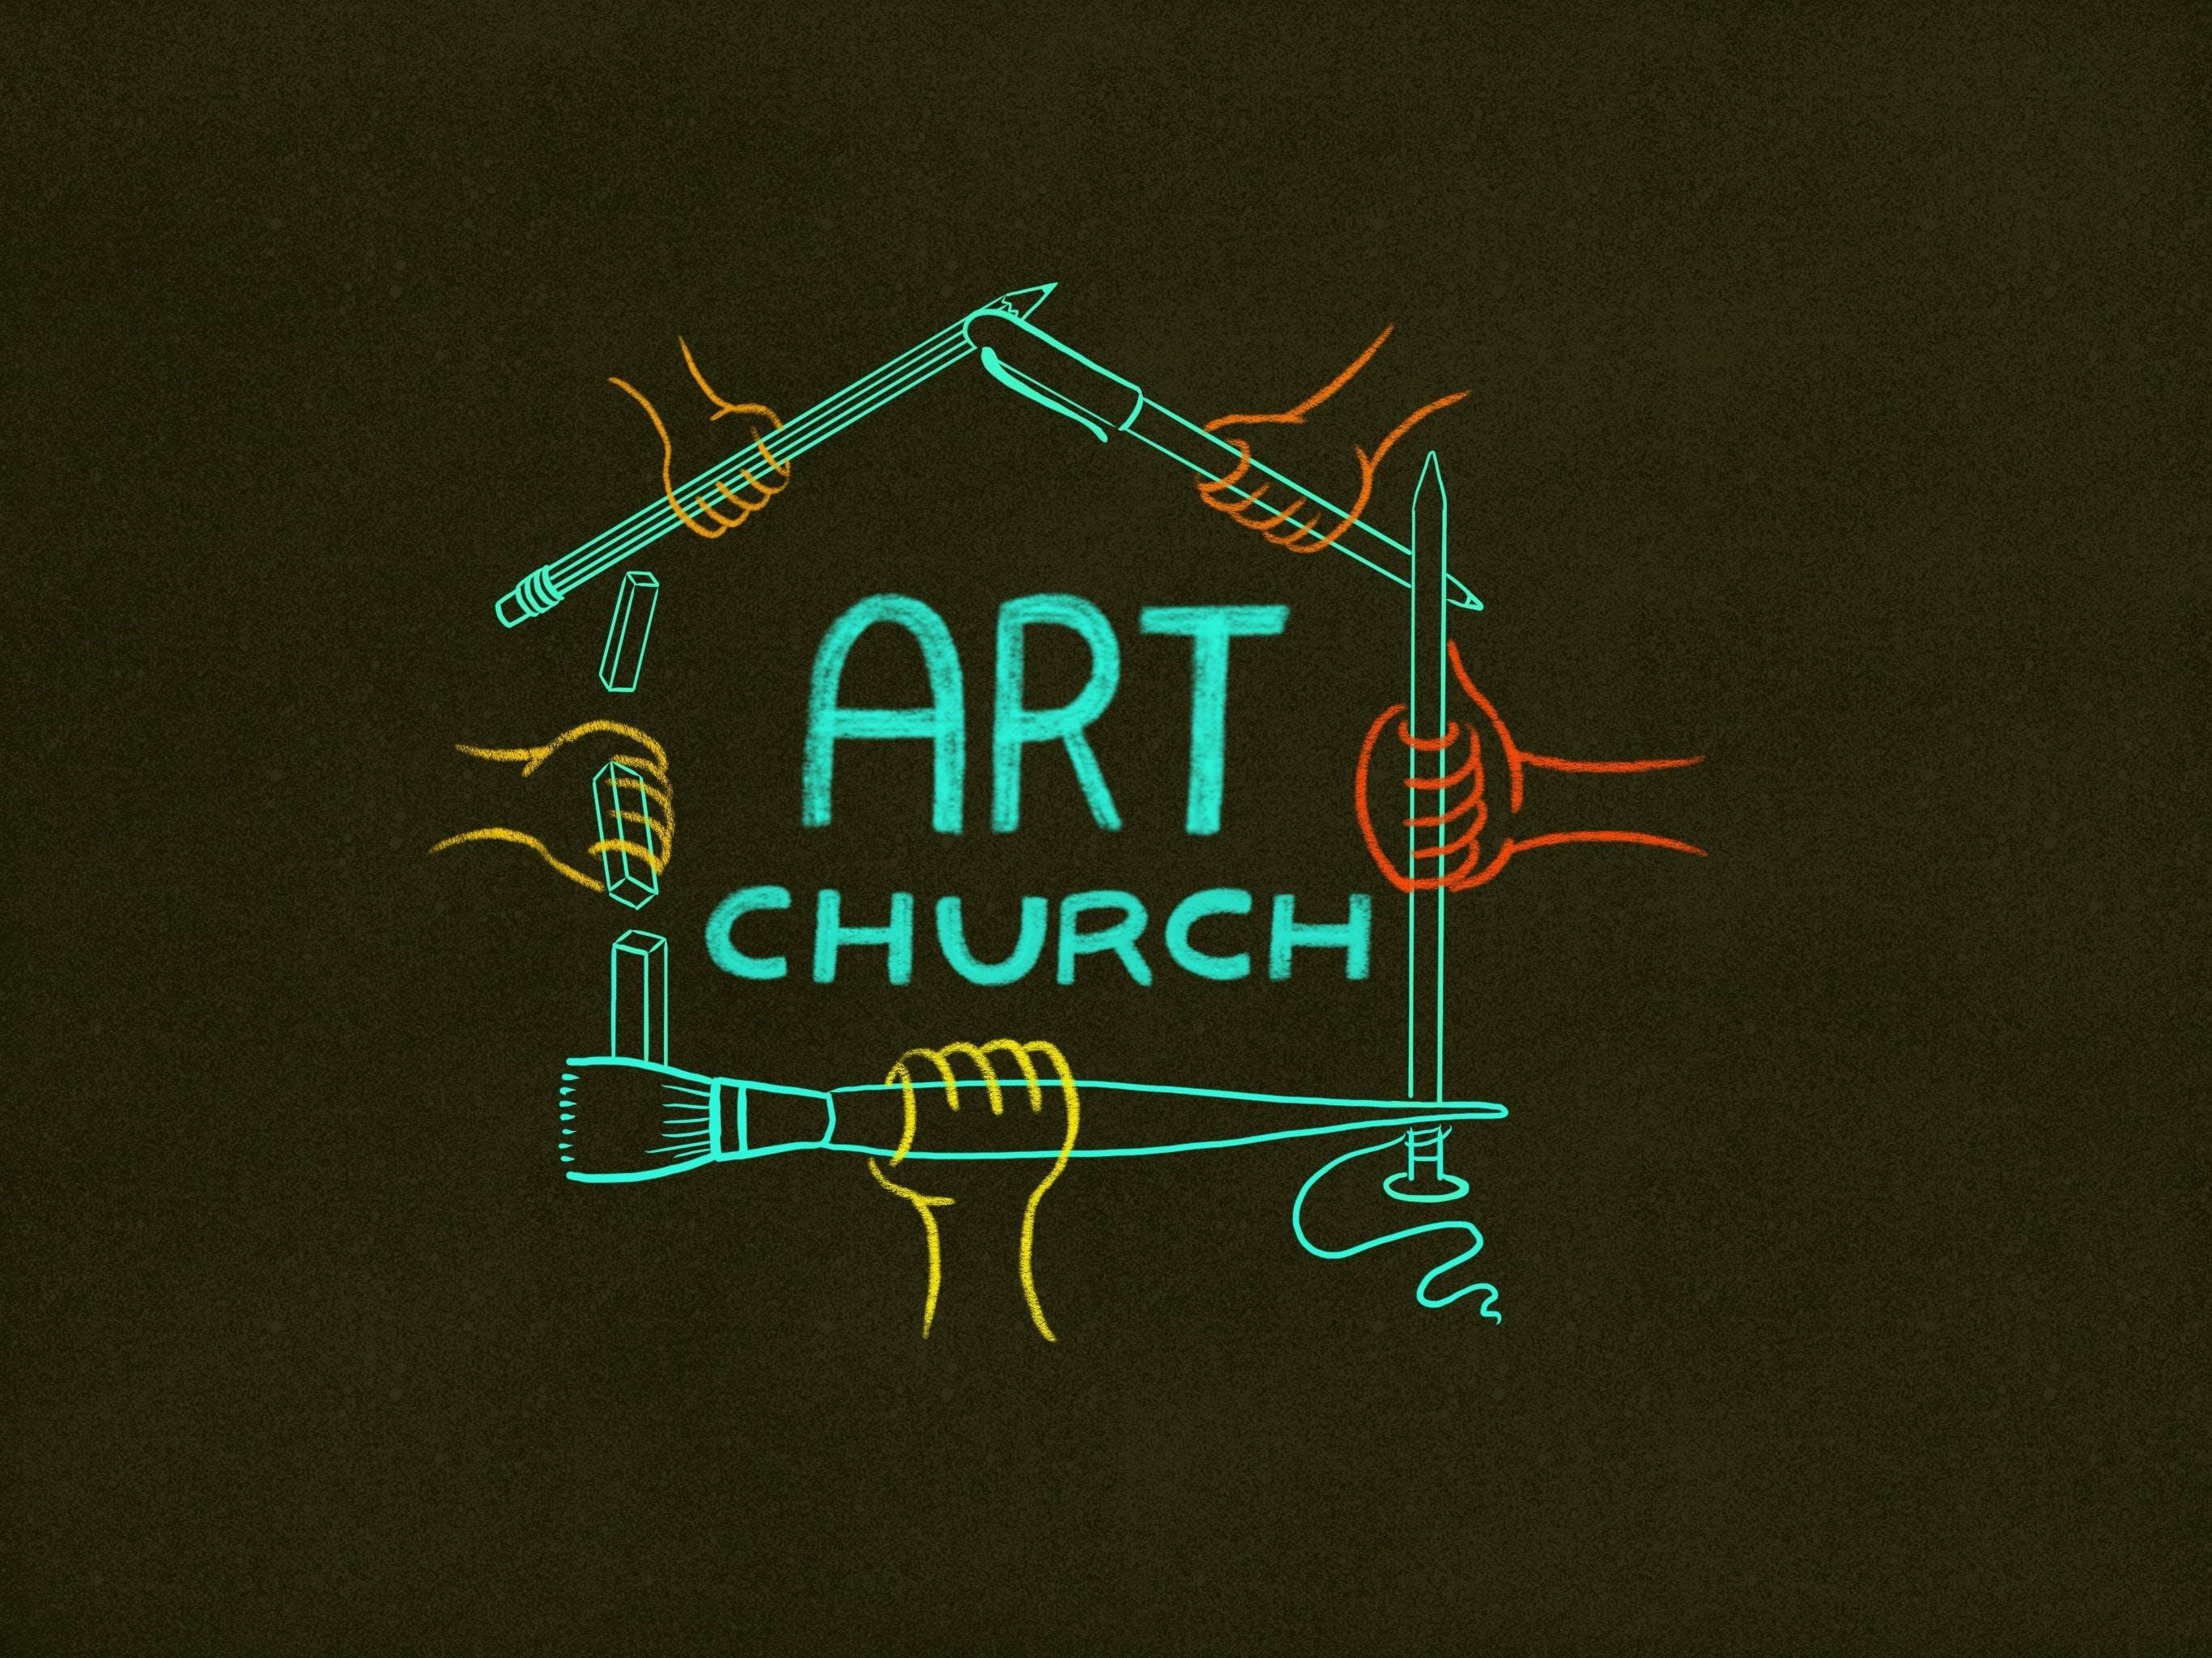 ART CHURCH II